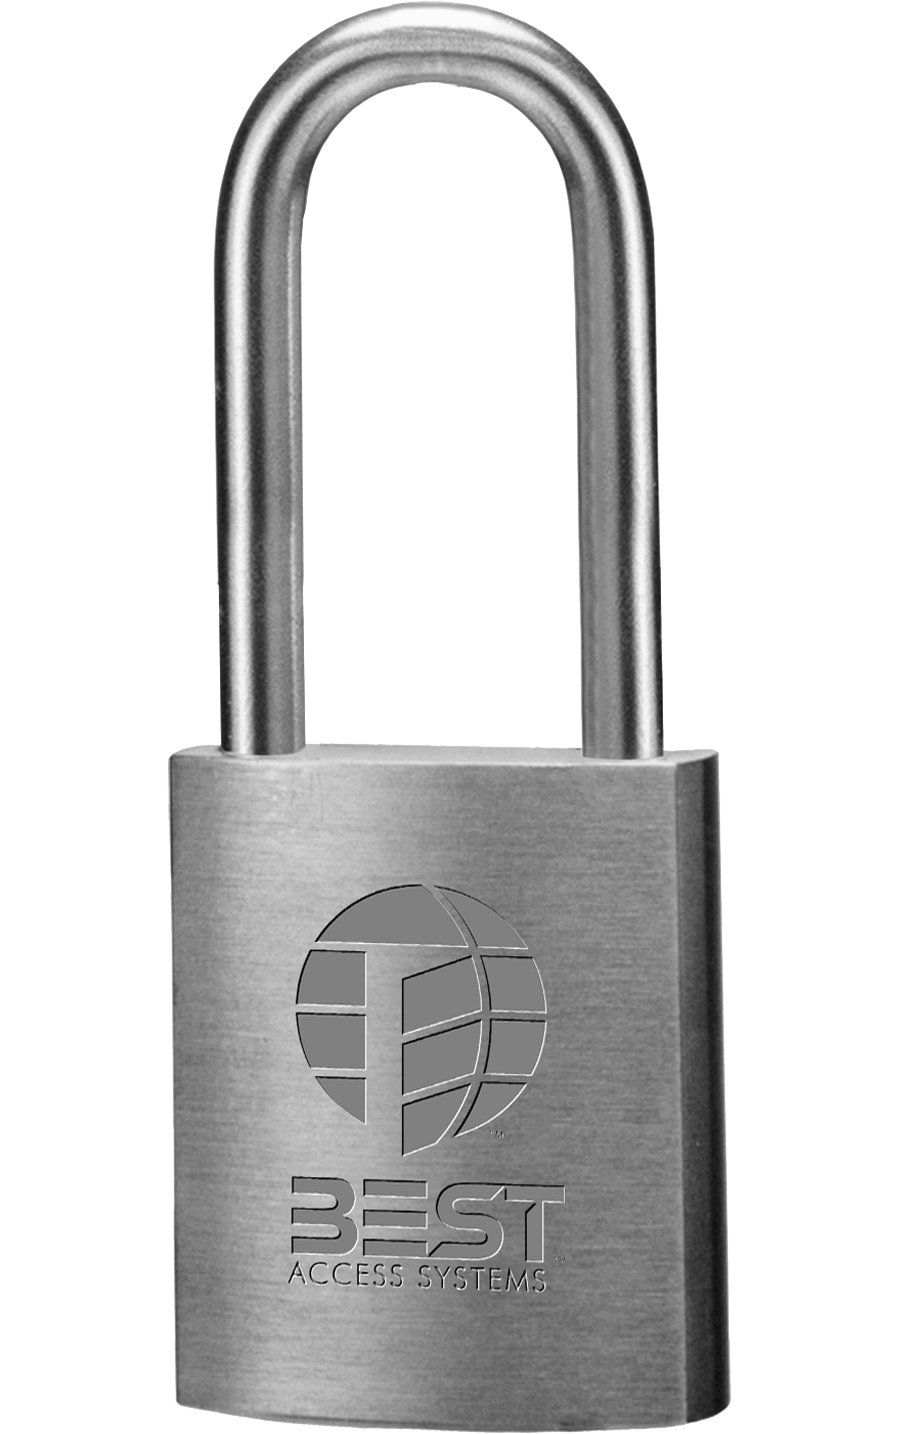 Amazon.com: Best sistemas de acceso 21b772l Candado, candado ...